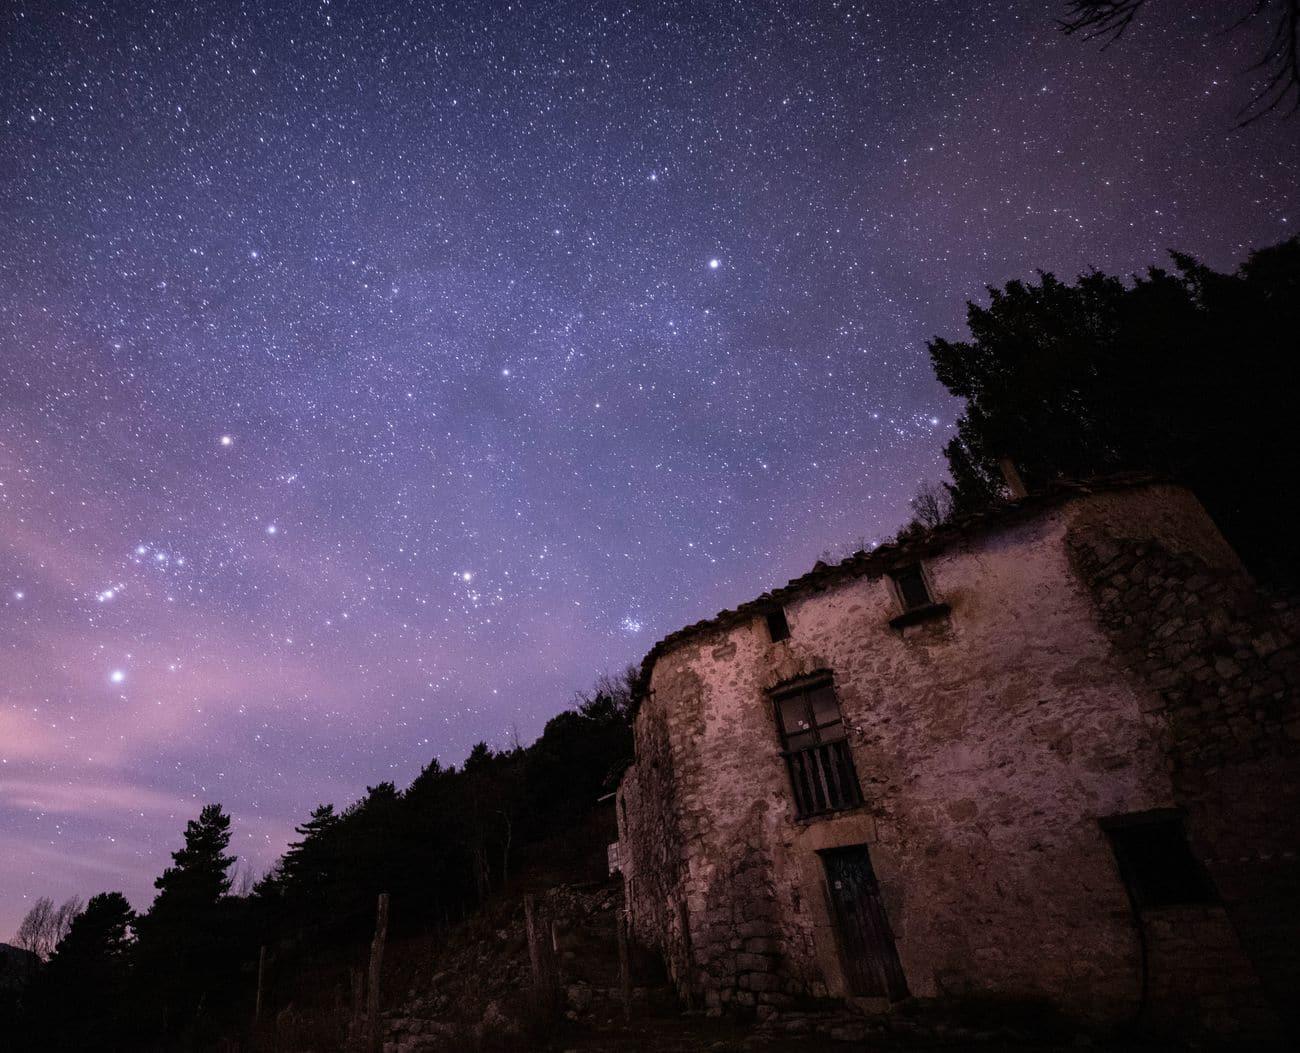 Starry background (Orion and Taurus Constellation, Pleiades and others) and Petronila's house. Lliurona. Alta Garrotxa 02.03.19. Kilian Vindel   -  Canon EOS 6D MARK II - IRIX Firefly 15mm f/2.4 30